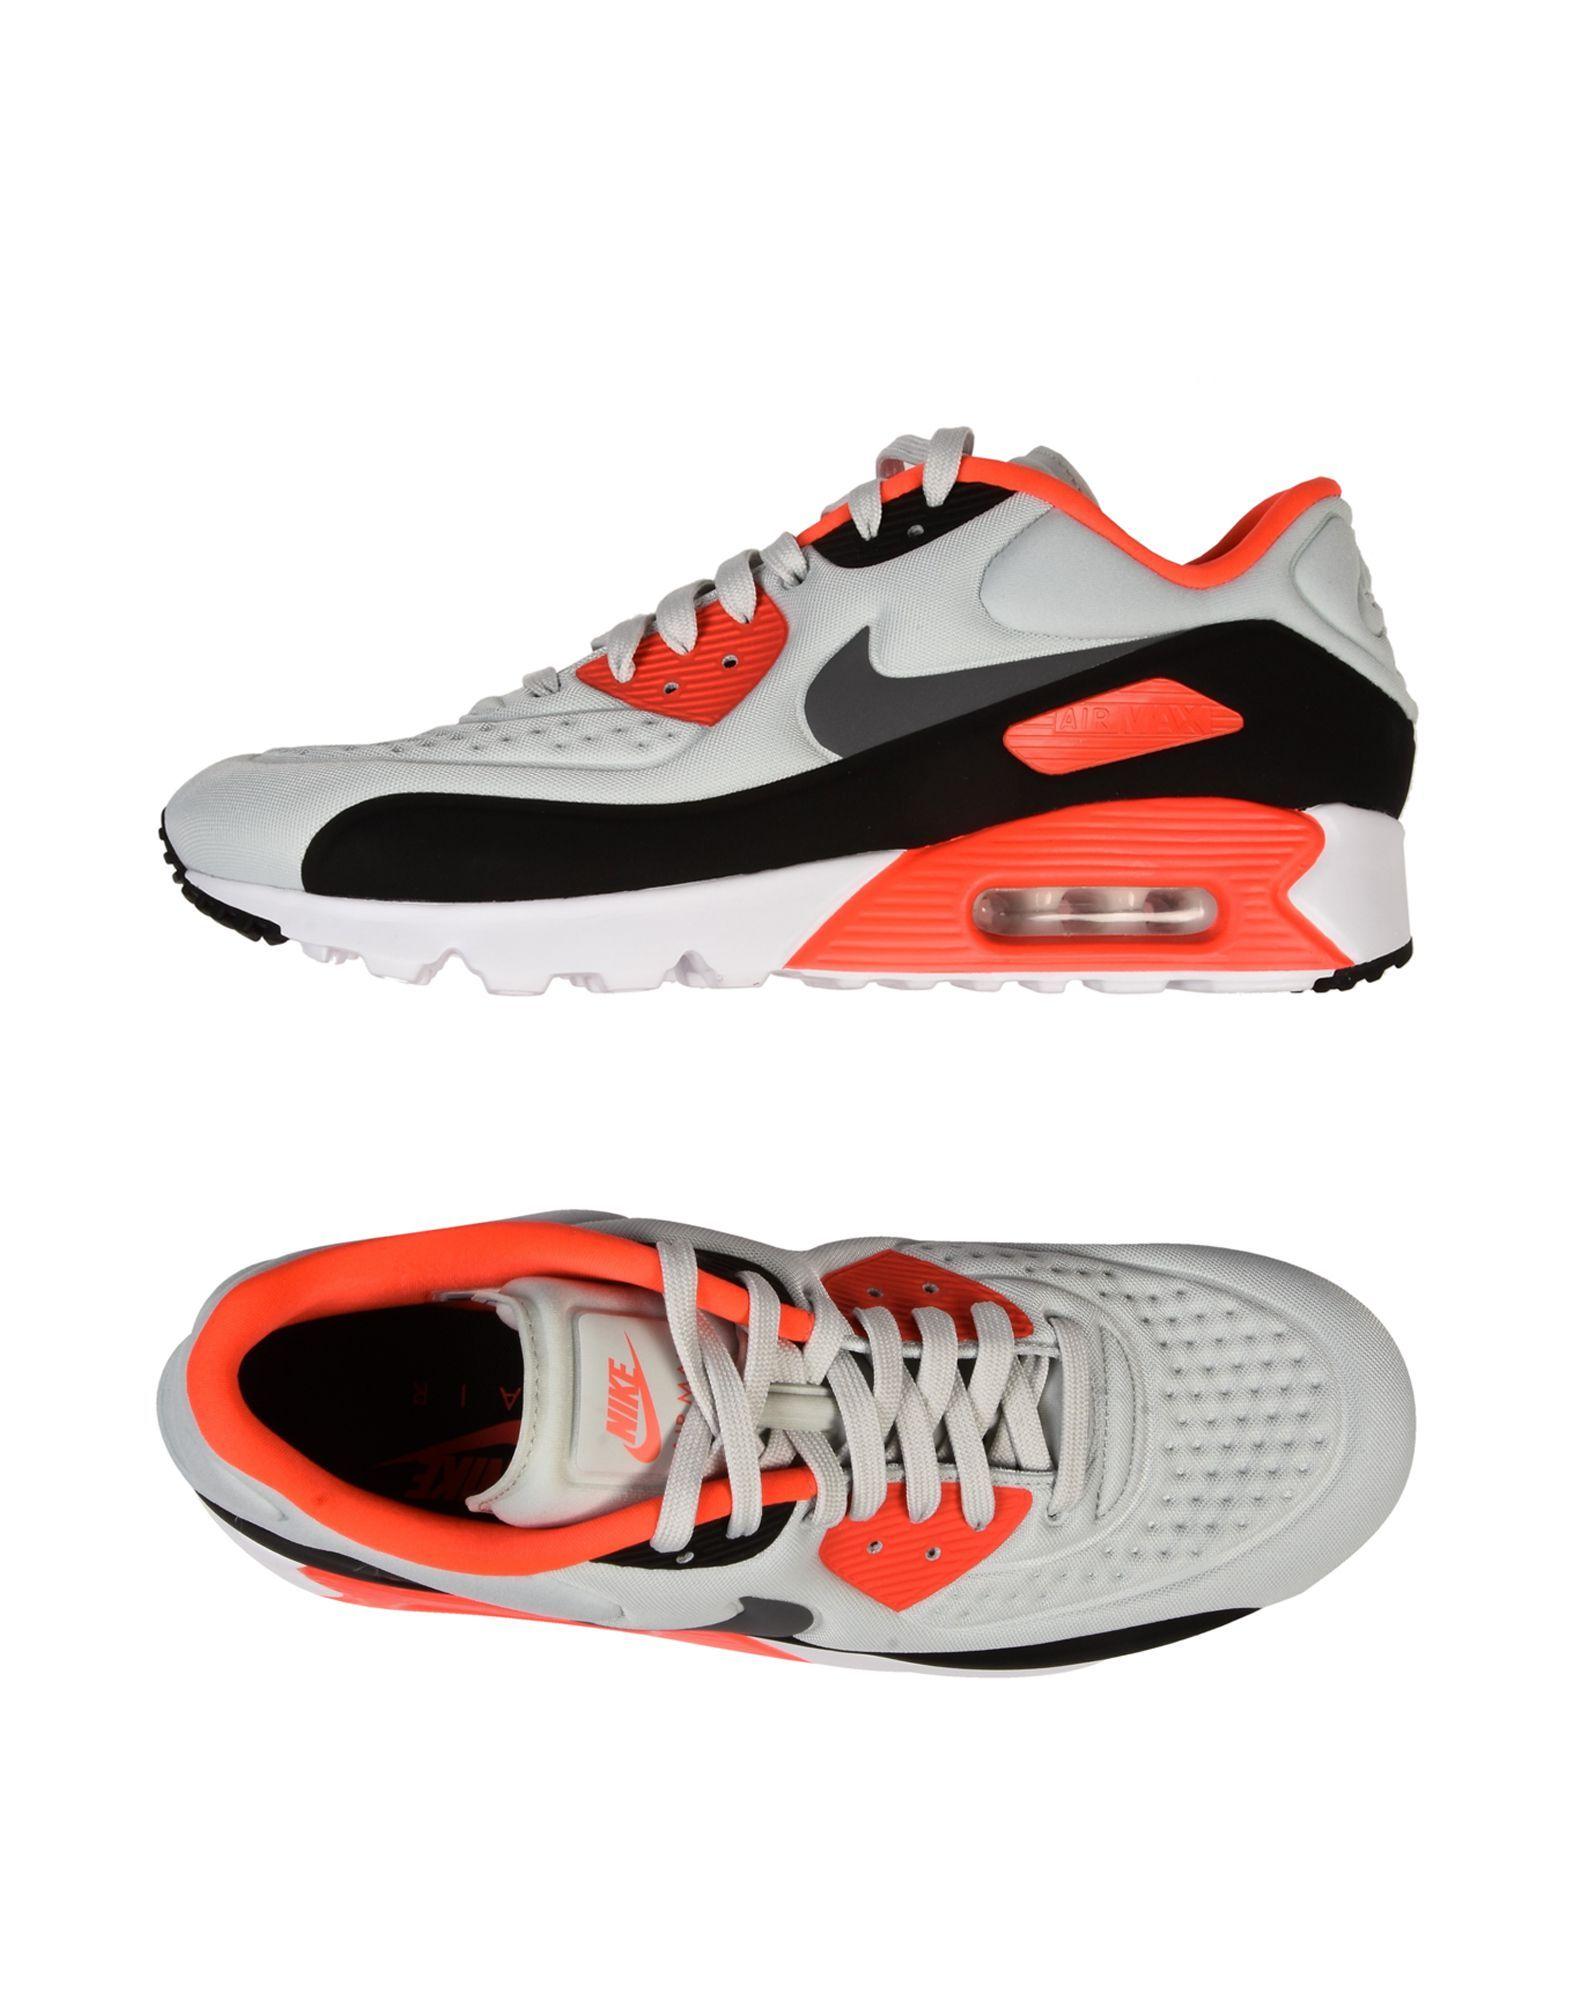 nike roshe run blancas y negras venta, Nike hombre calzado air max 90 ultra  se